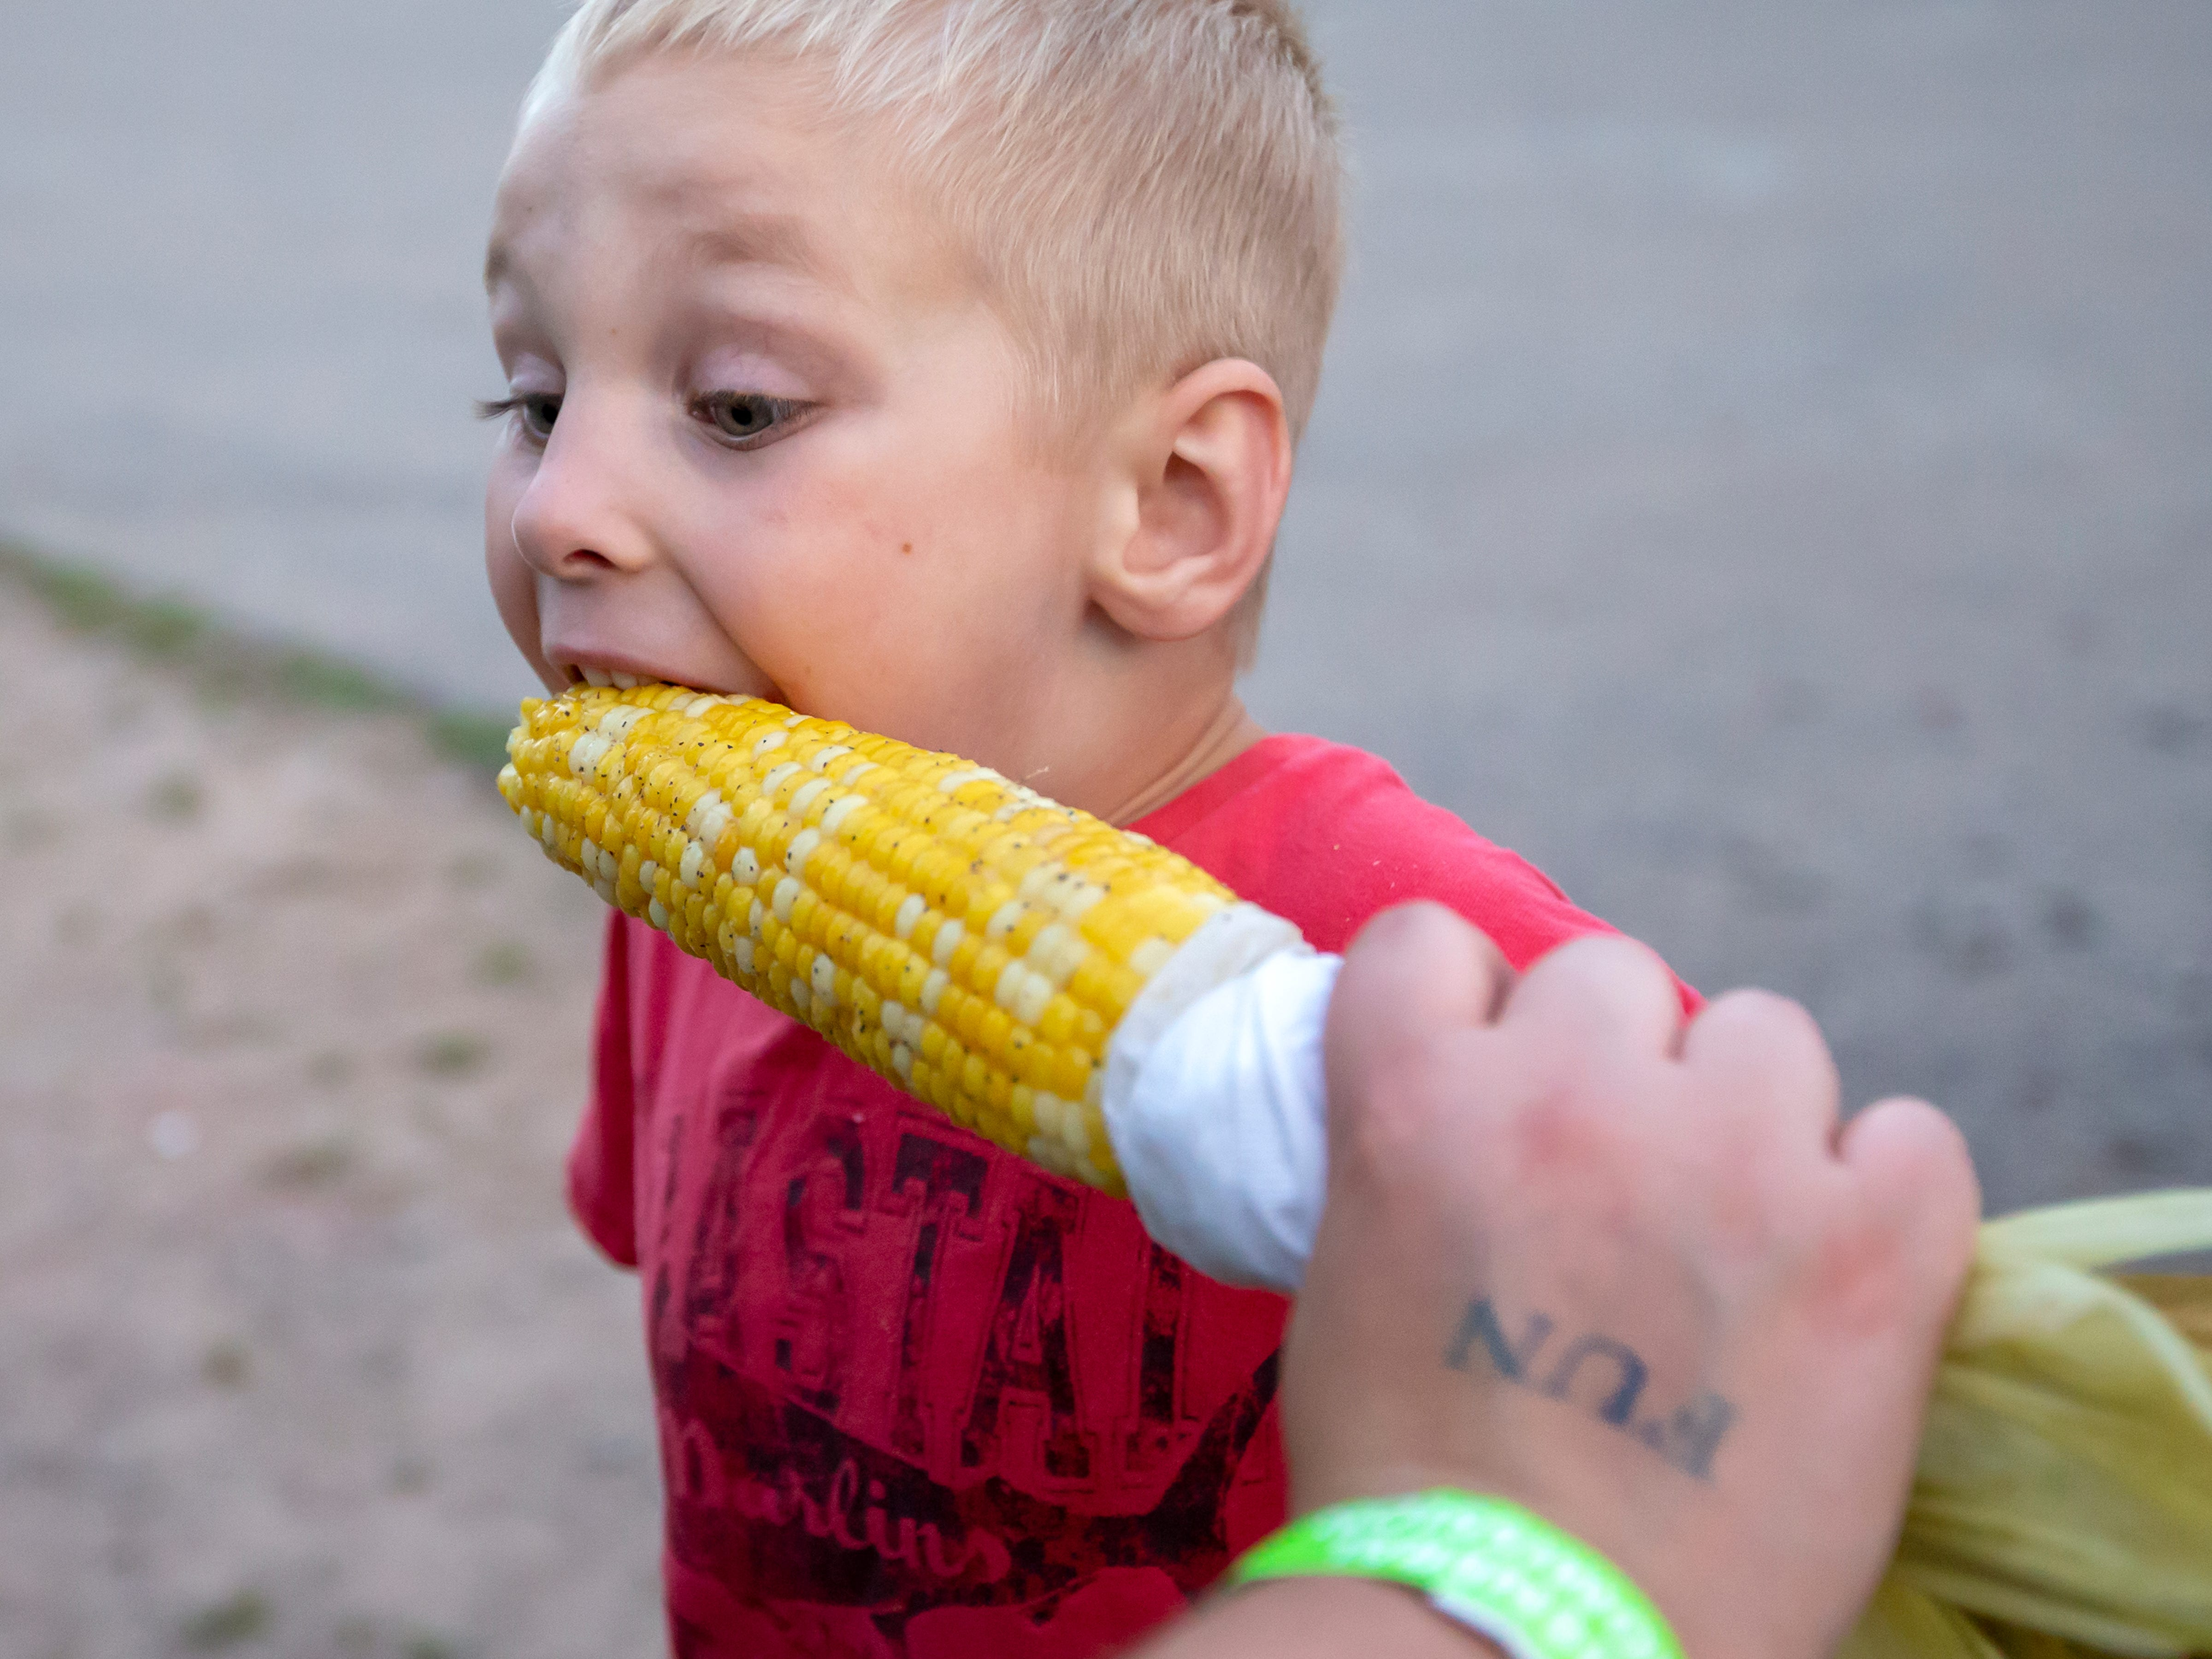 Maverick Bartow of Oshkosh takes a bite into corn on the cob during the Winnebago County Fair on Friday, Aug. 3, 2018.